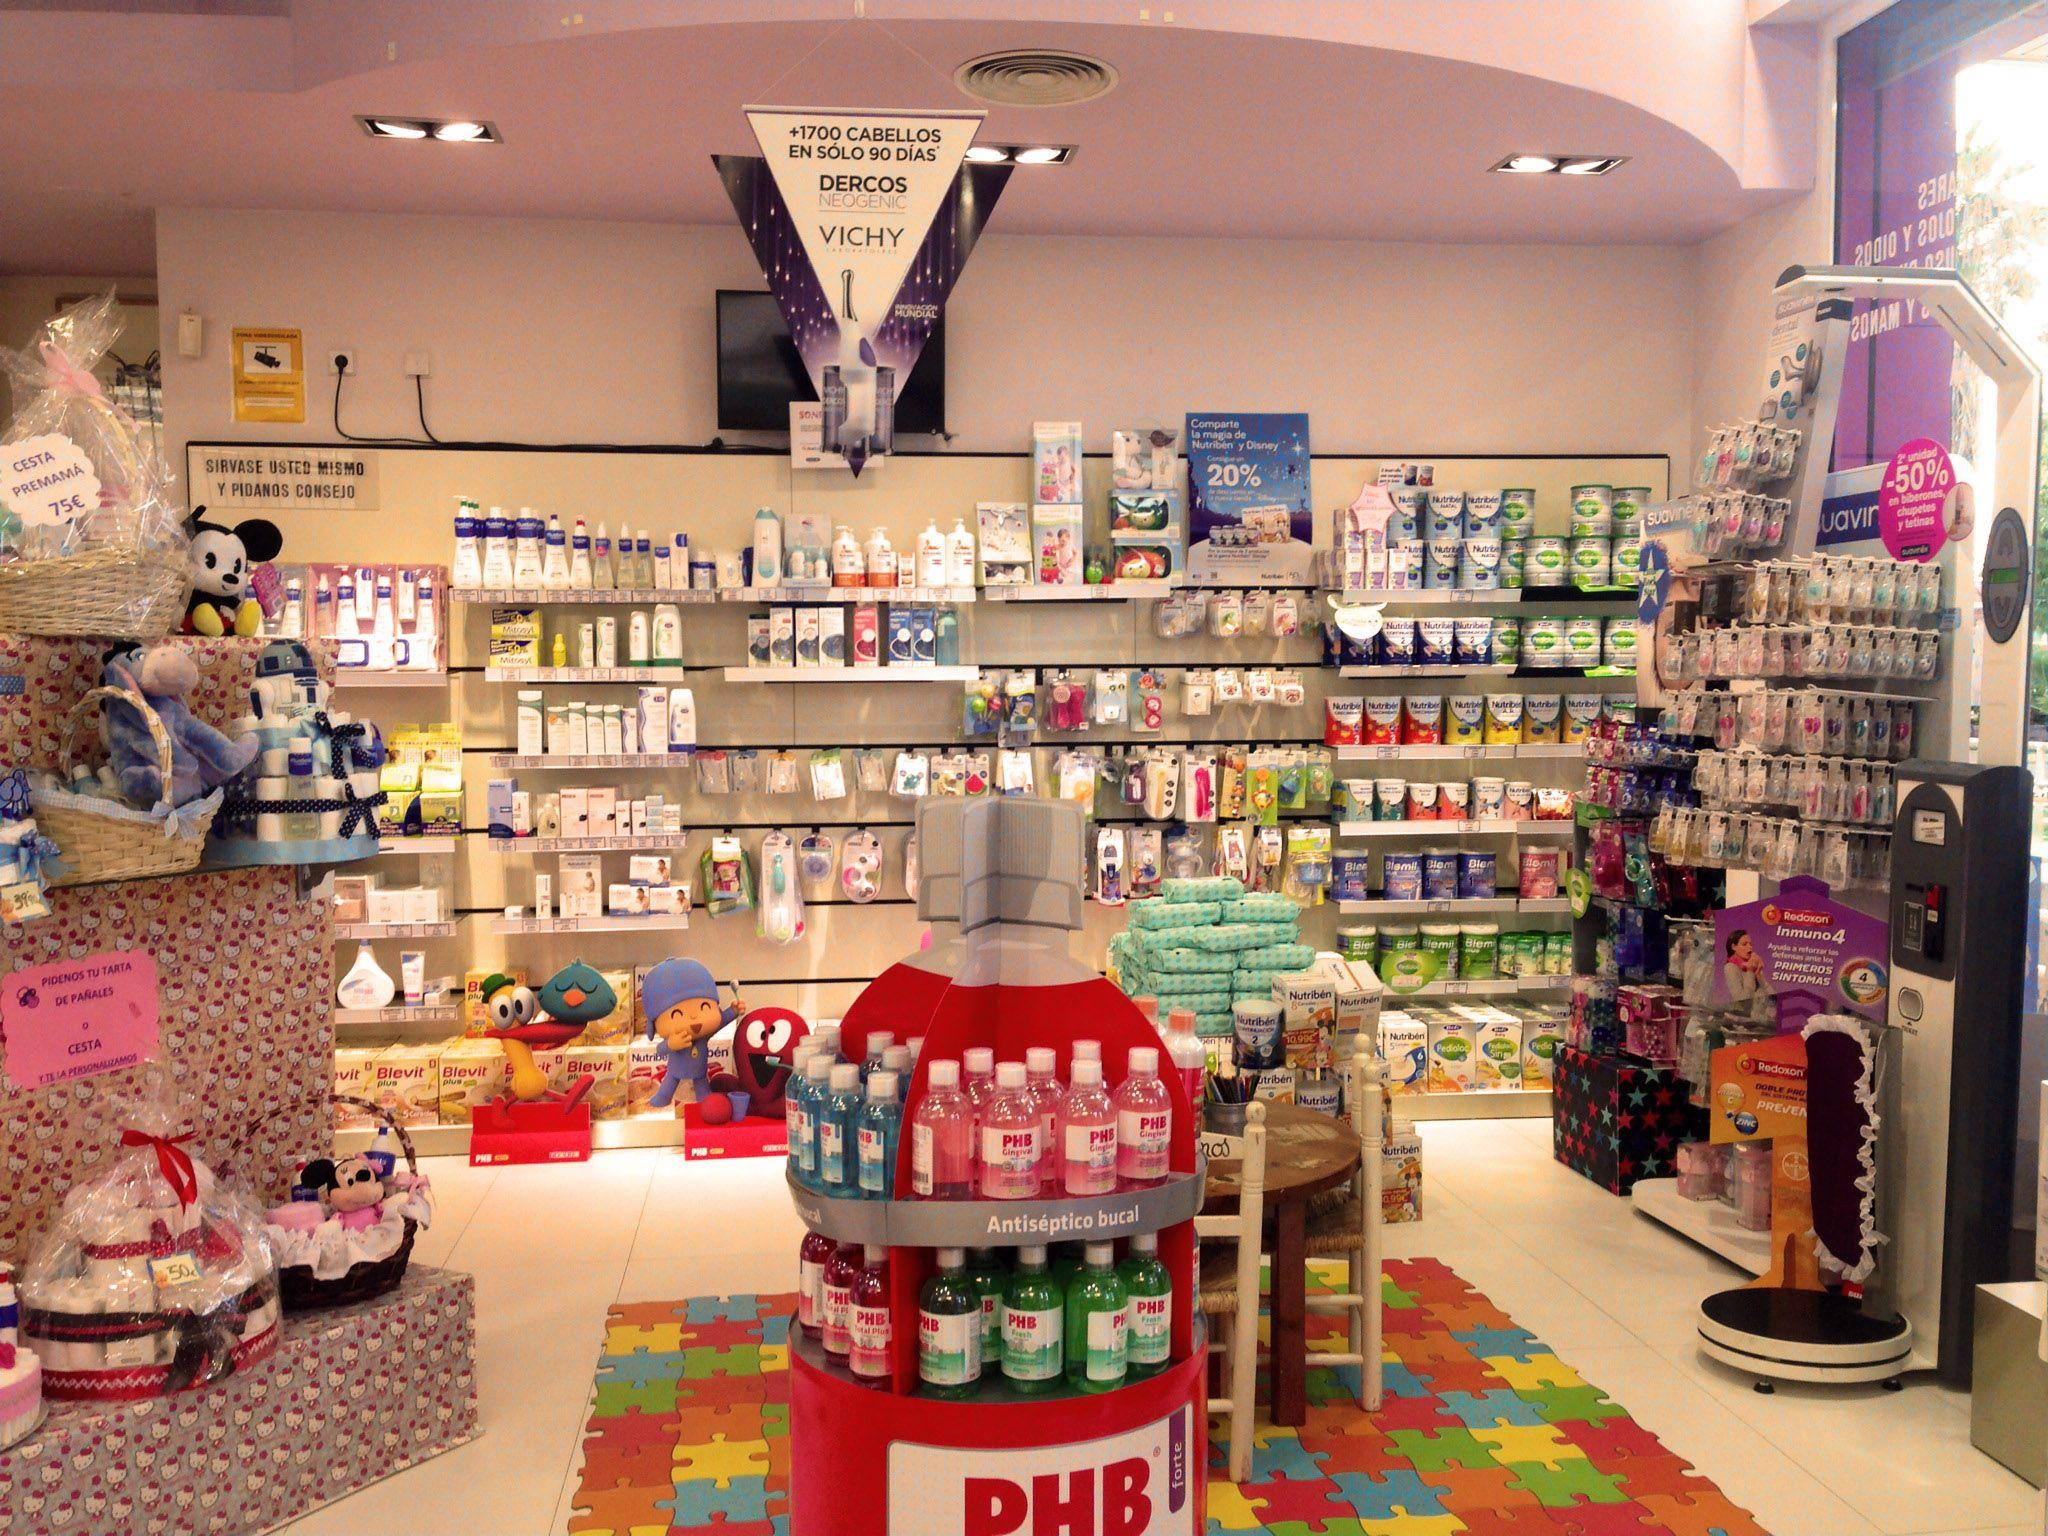 Farmacias venta online